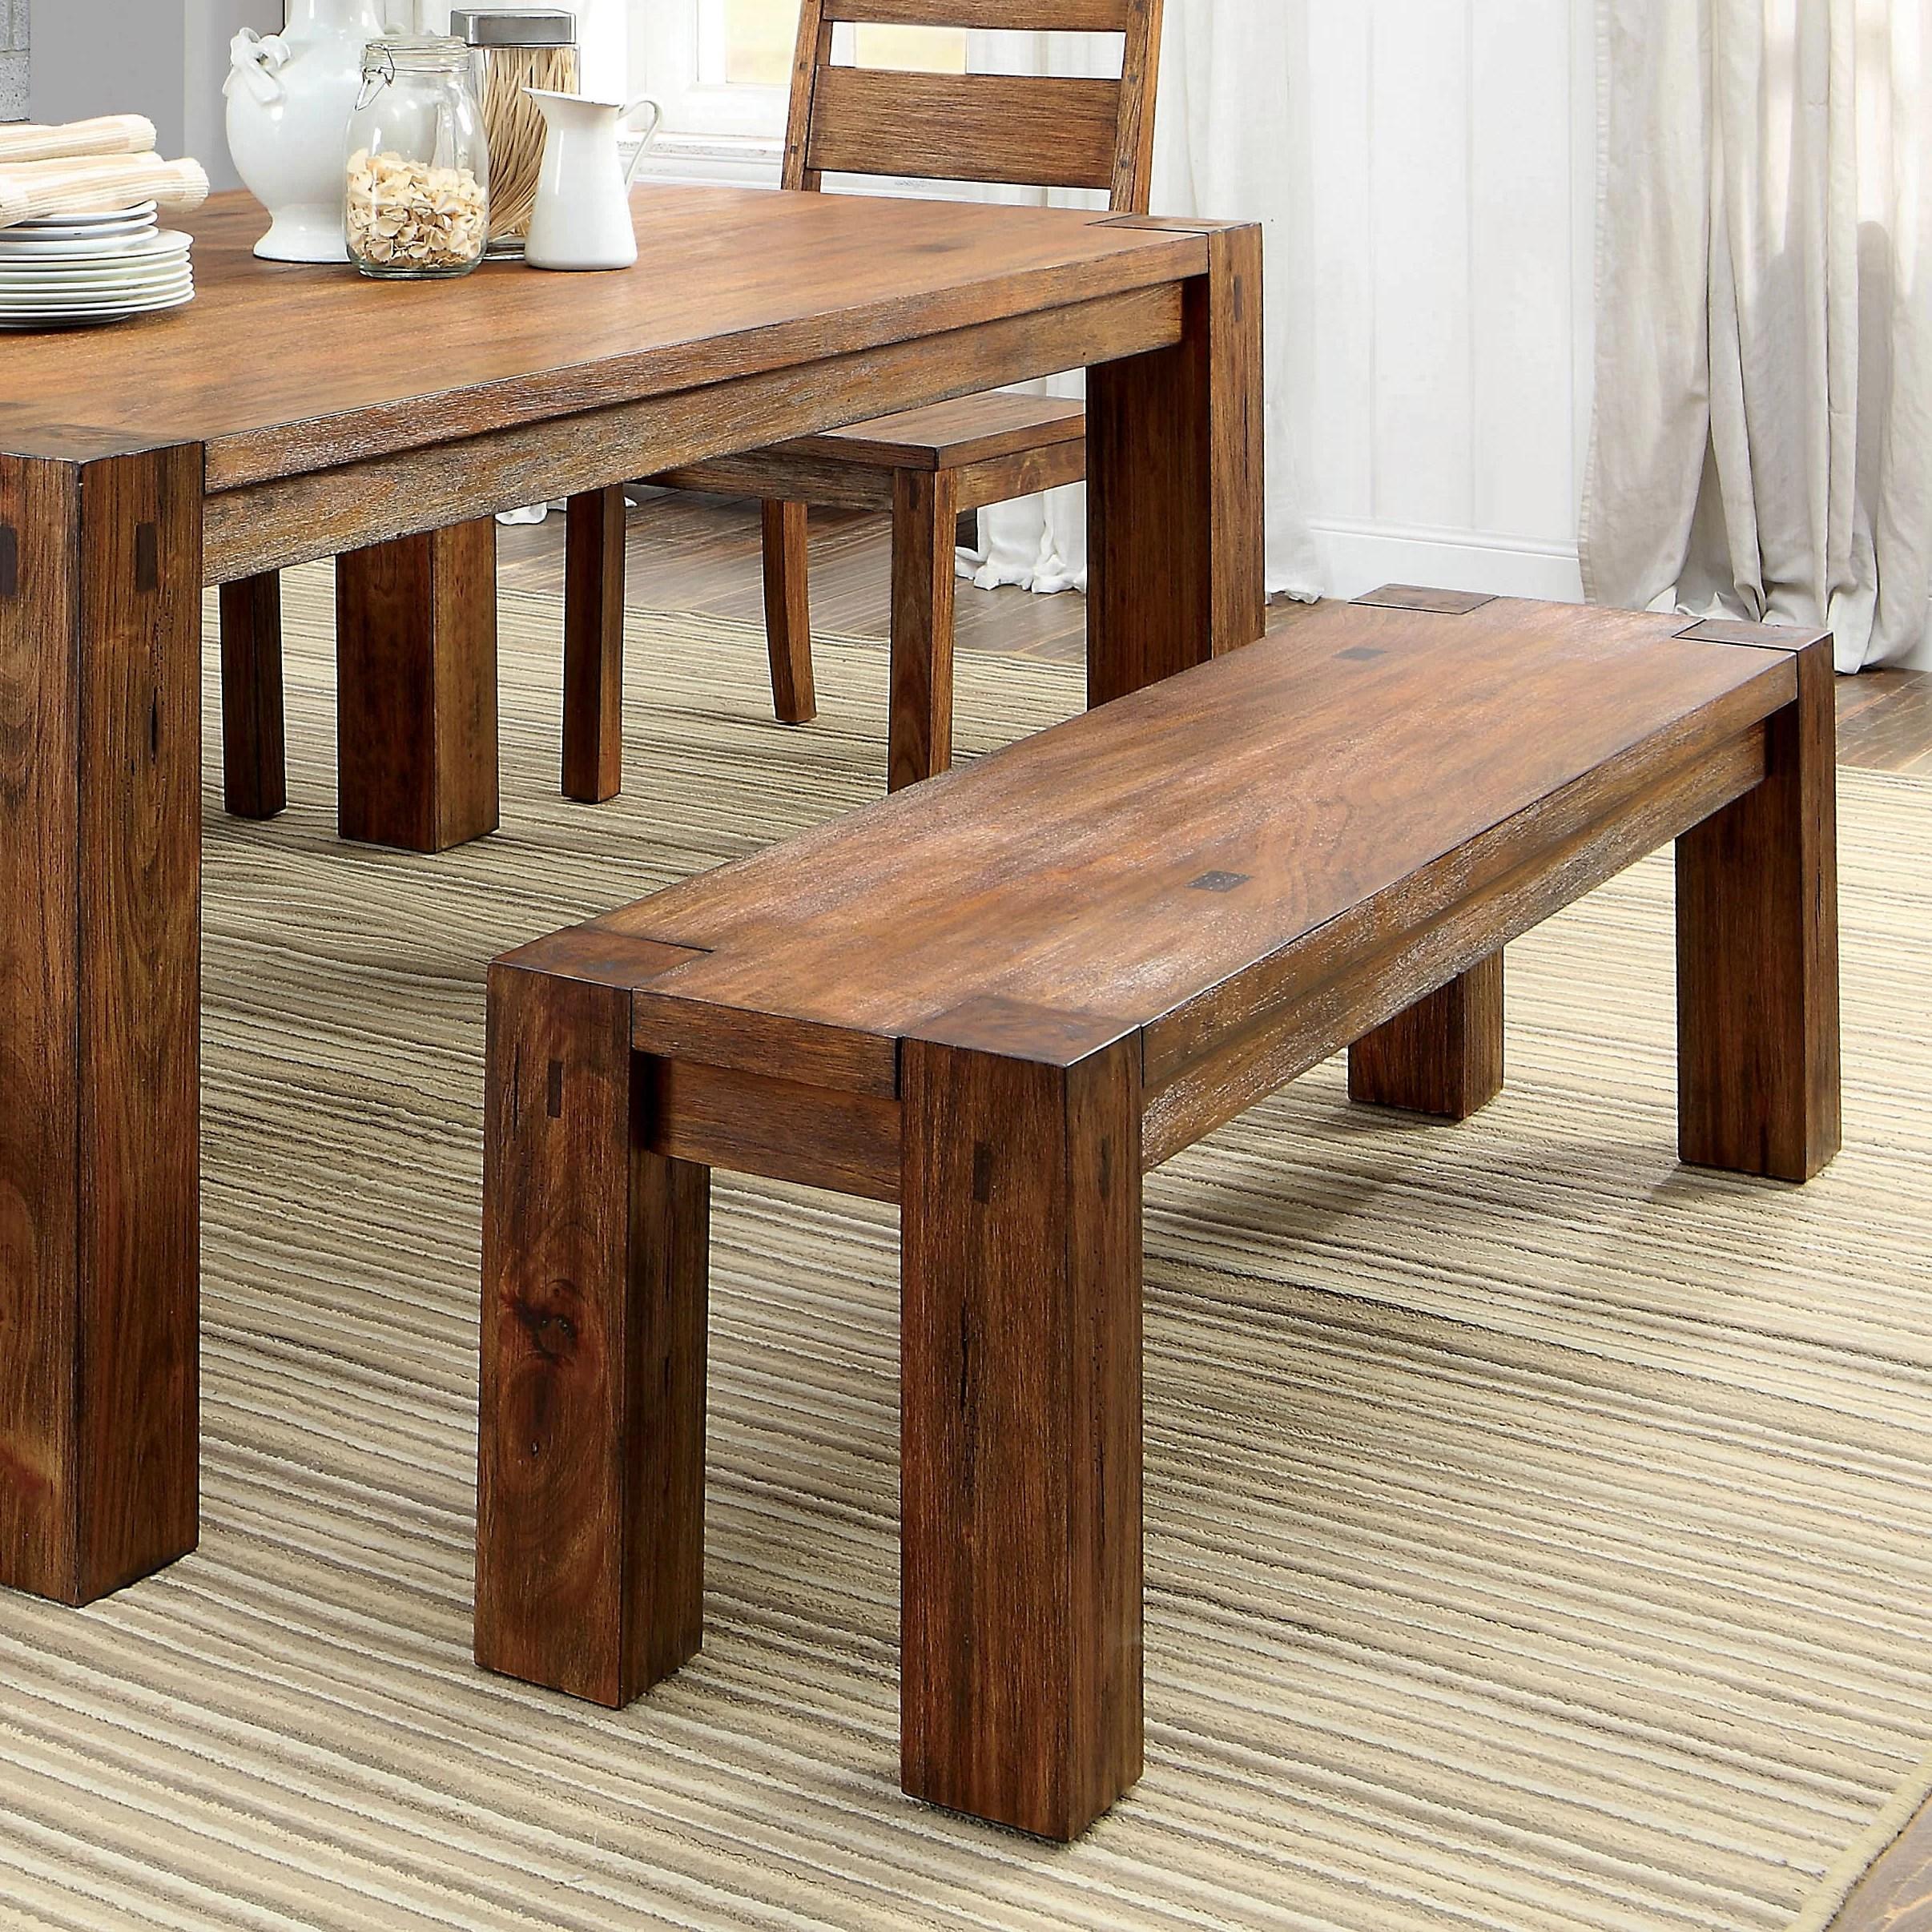 Hokku Designs Bethanne Wood Kitchen Bench  Reviews  Wayfair